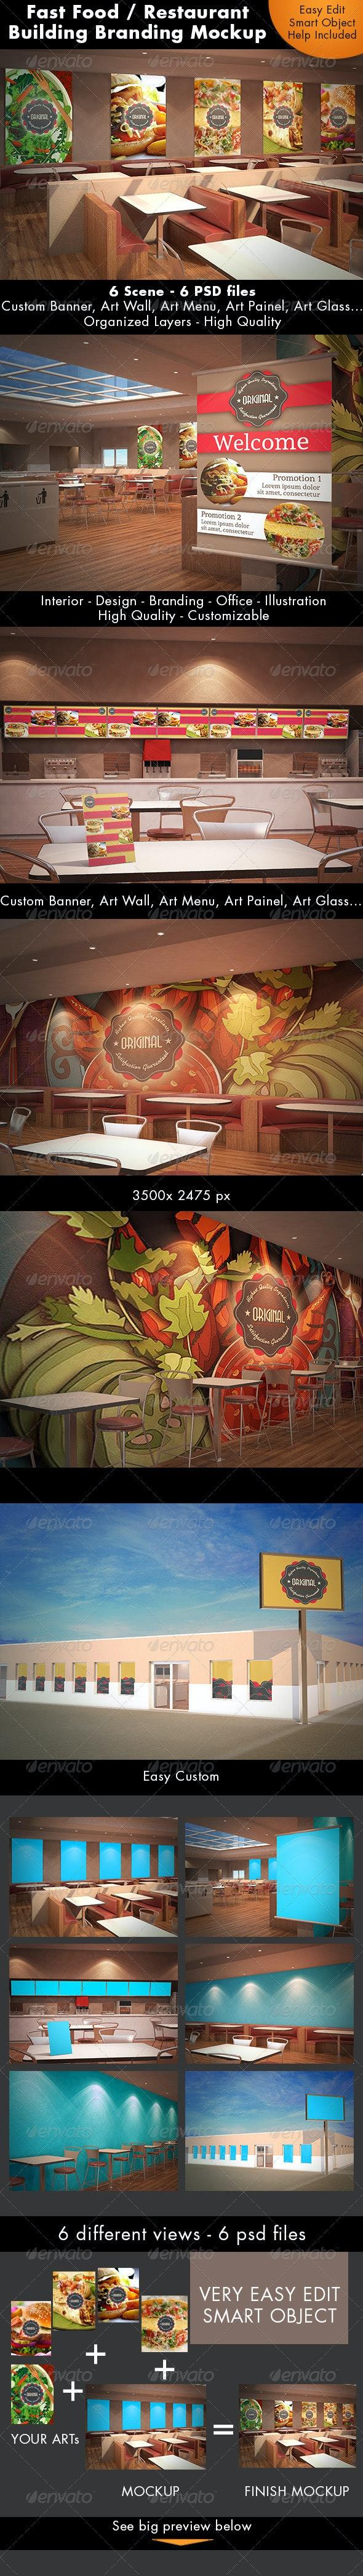 Fast Food Building Branding Mockup - Logo Product Mock-Ups